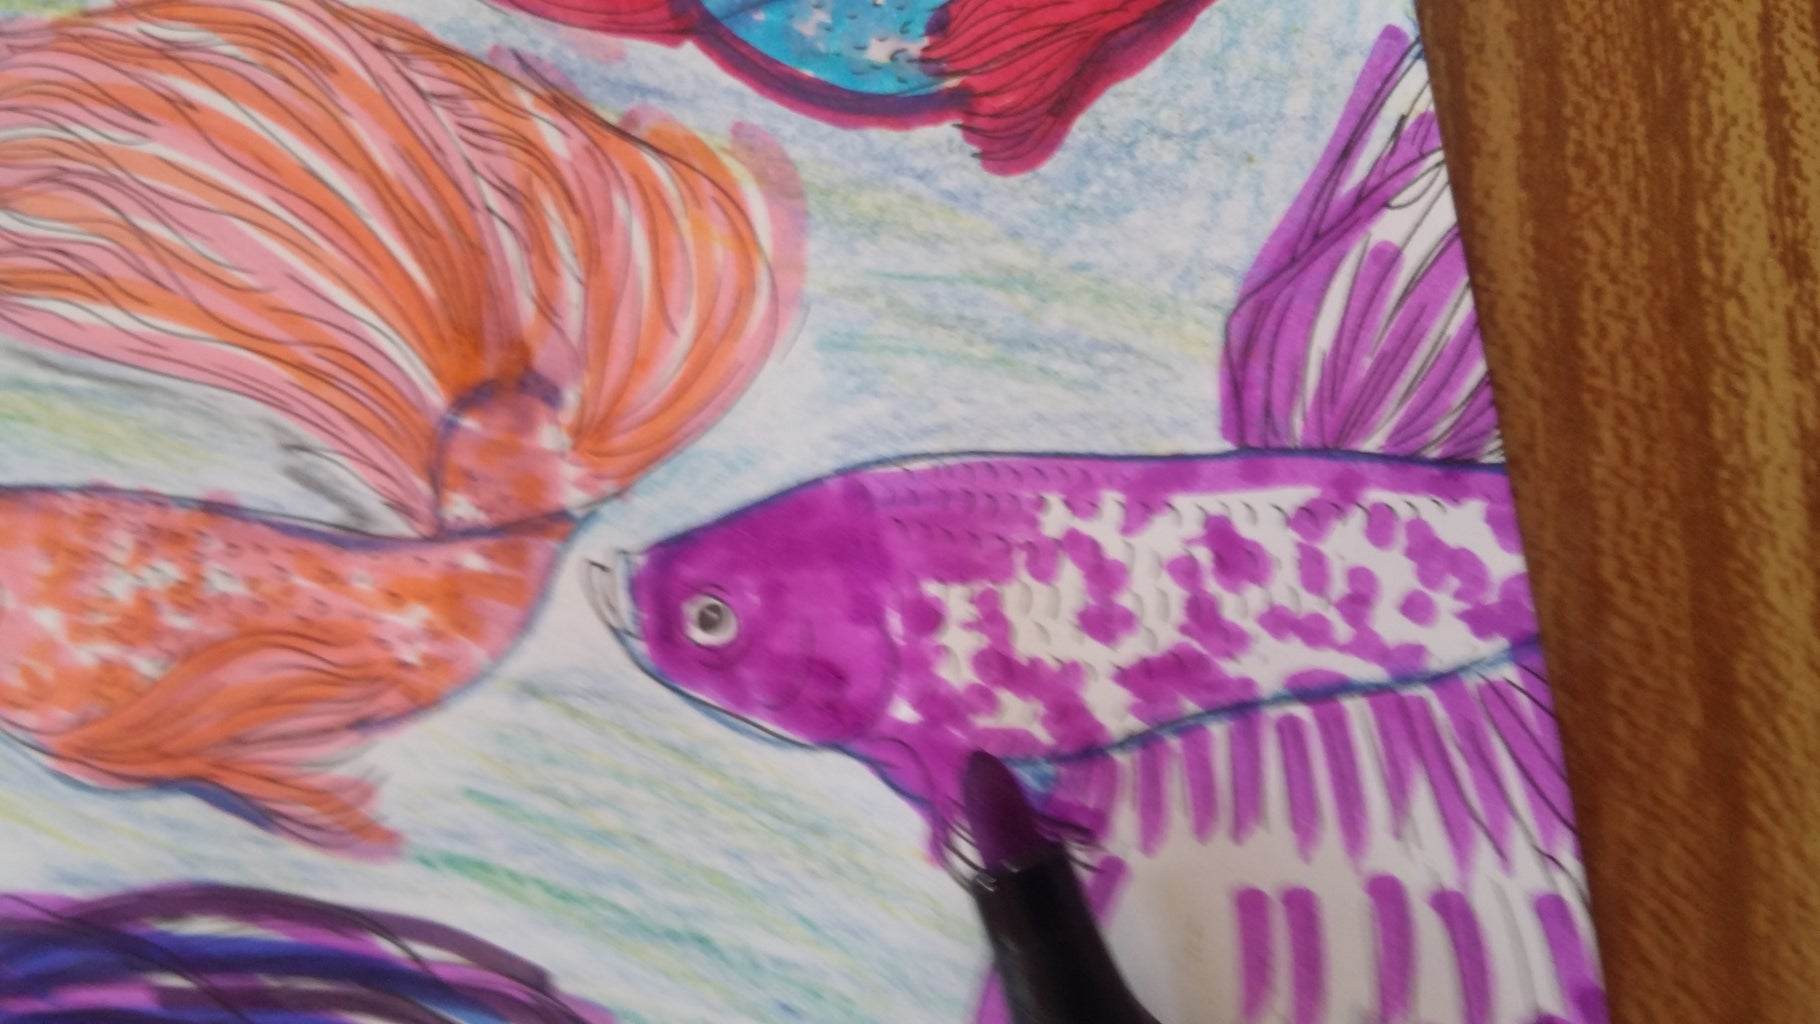 8th & 9th Fish